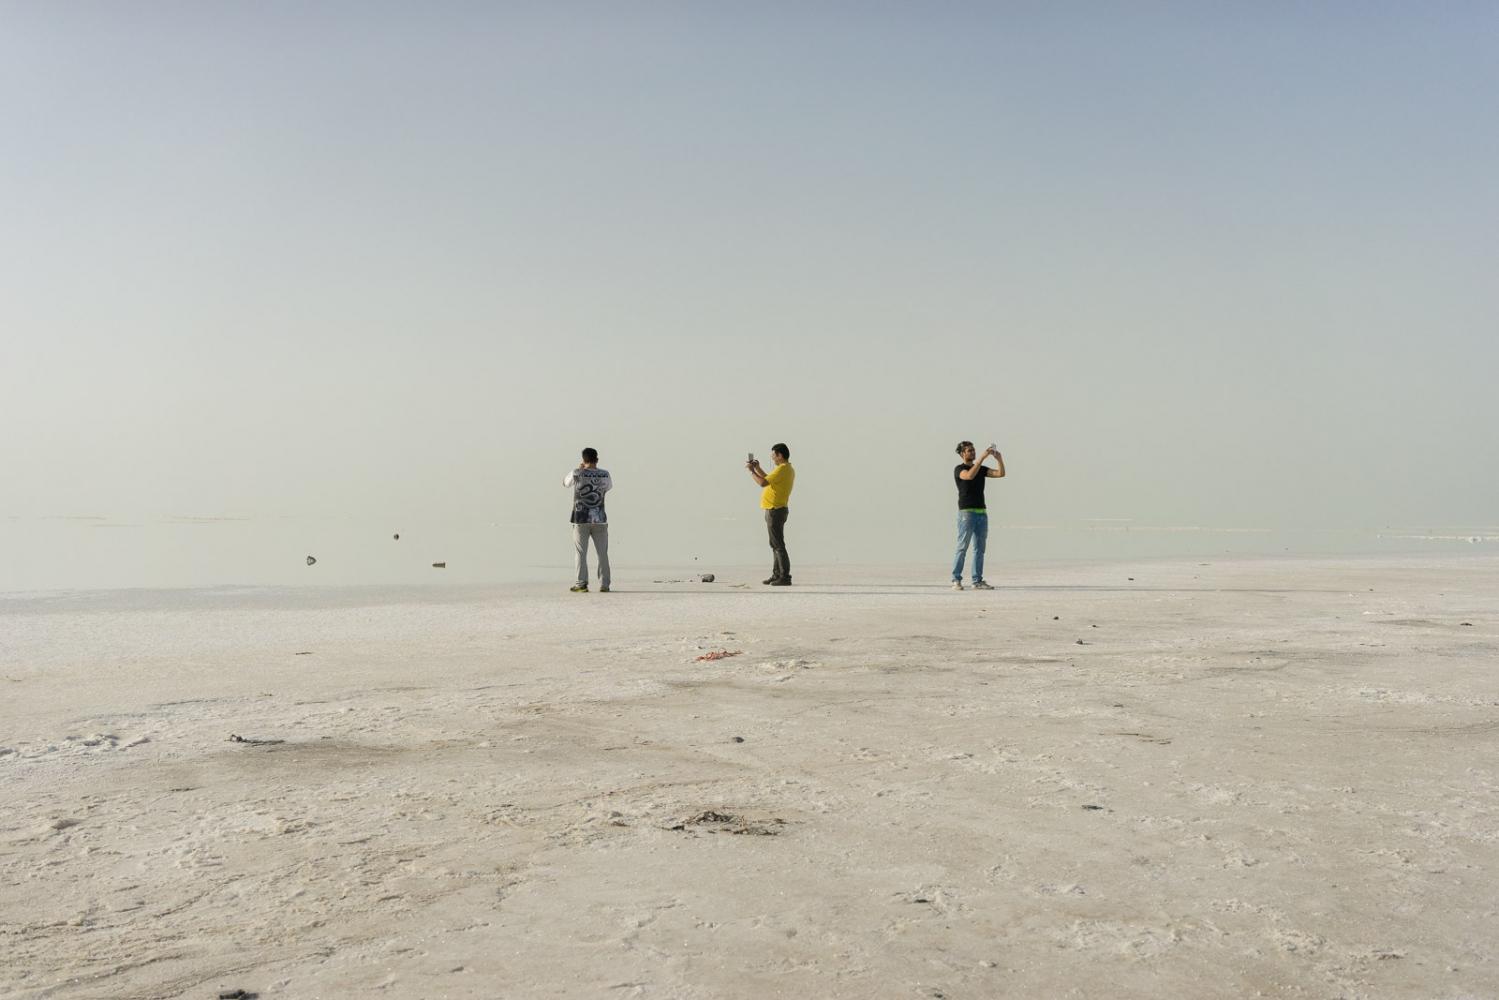 Art and Documentary Photography - Loading 015-iran_consumerism.jpg